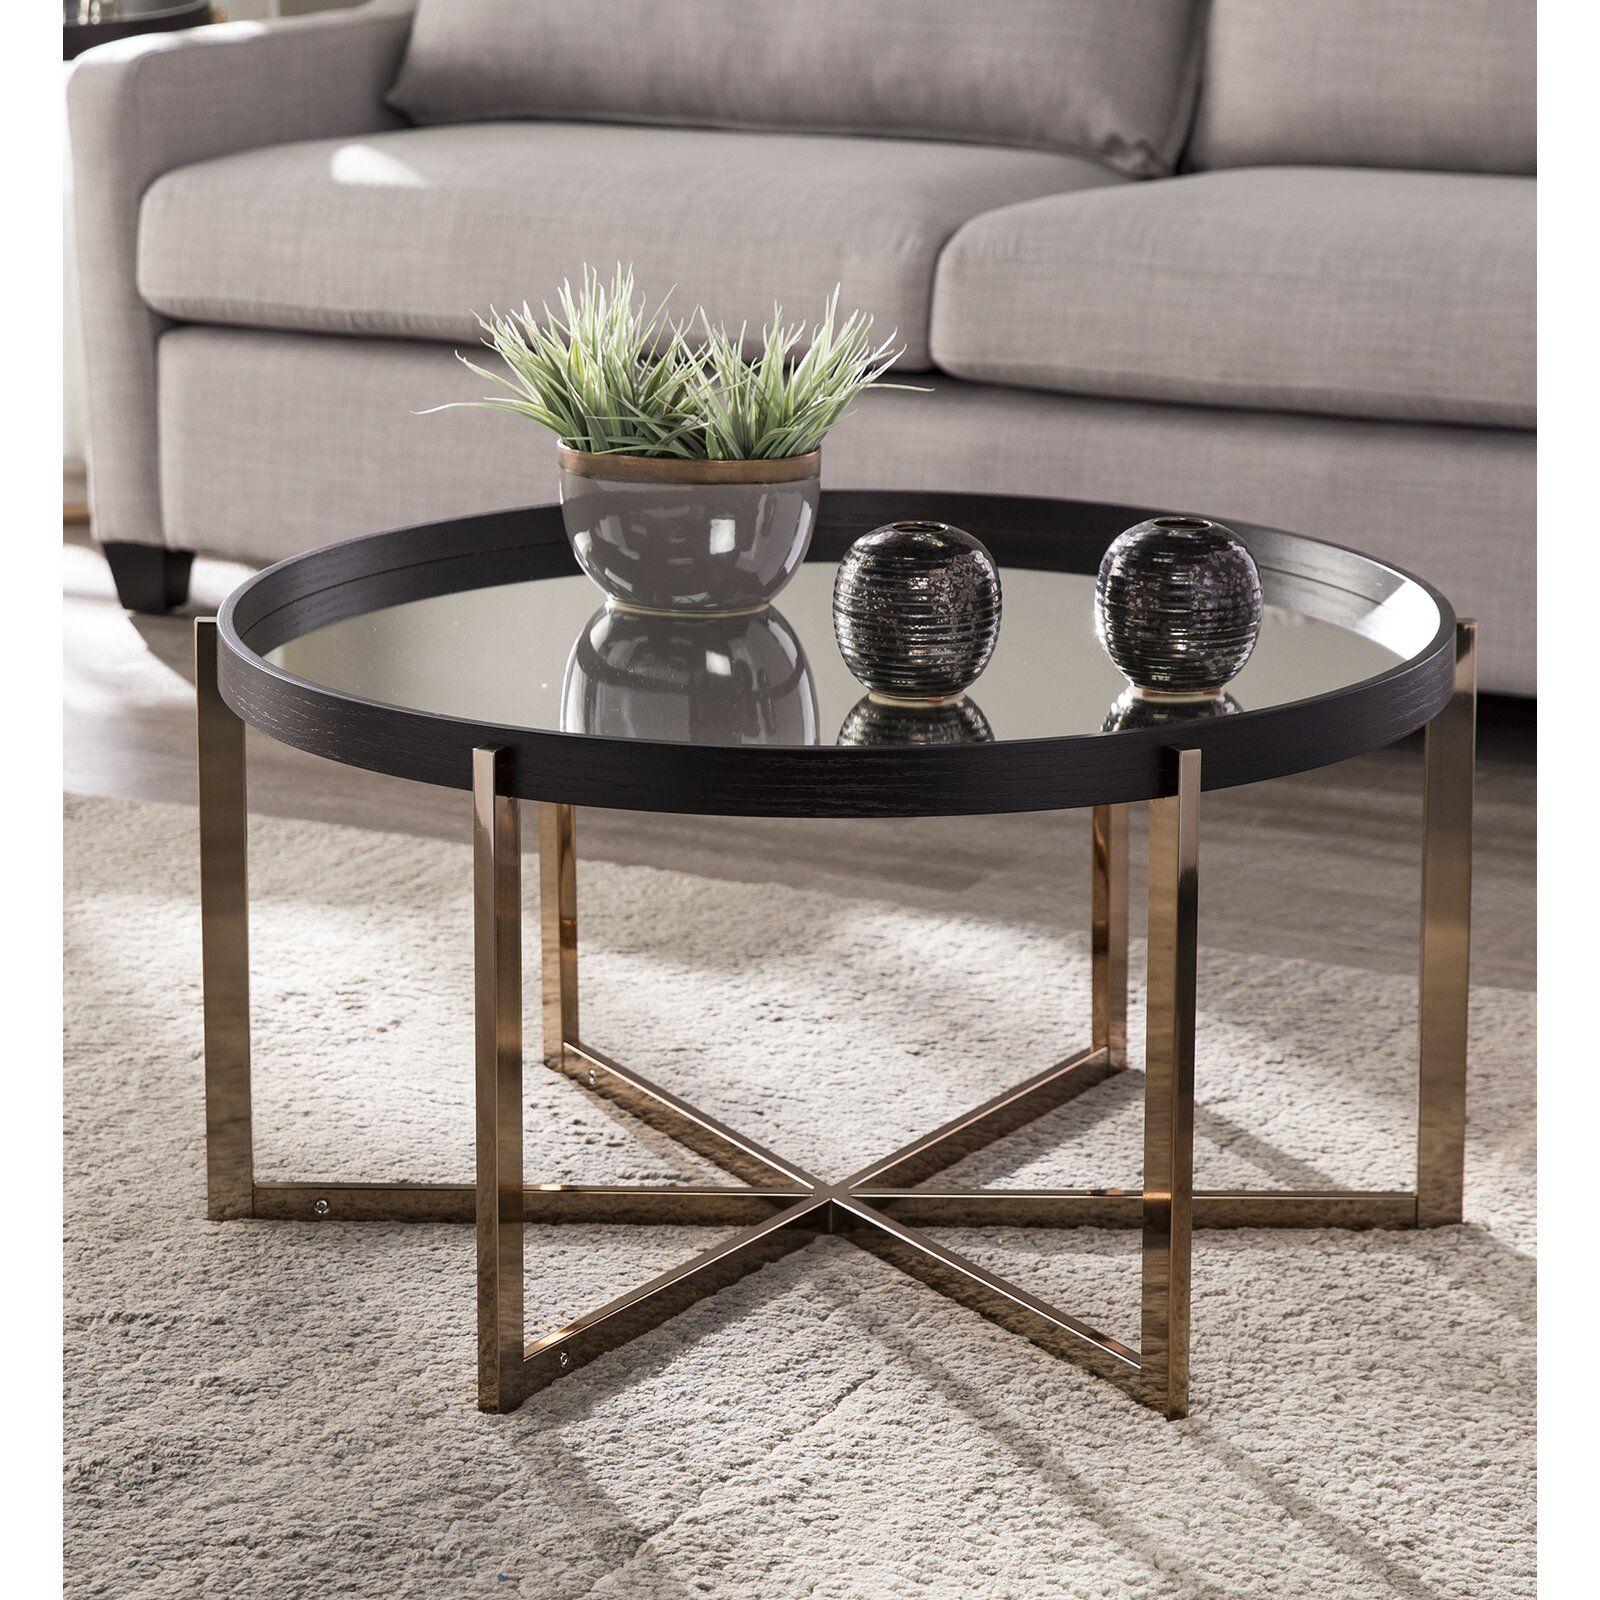 Mercer41 Cheesman Coffee Table Stolik Dlya Kofe Mebel Iz Stali Mebel [ 1600 x 1600 Pixel ]